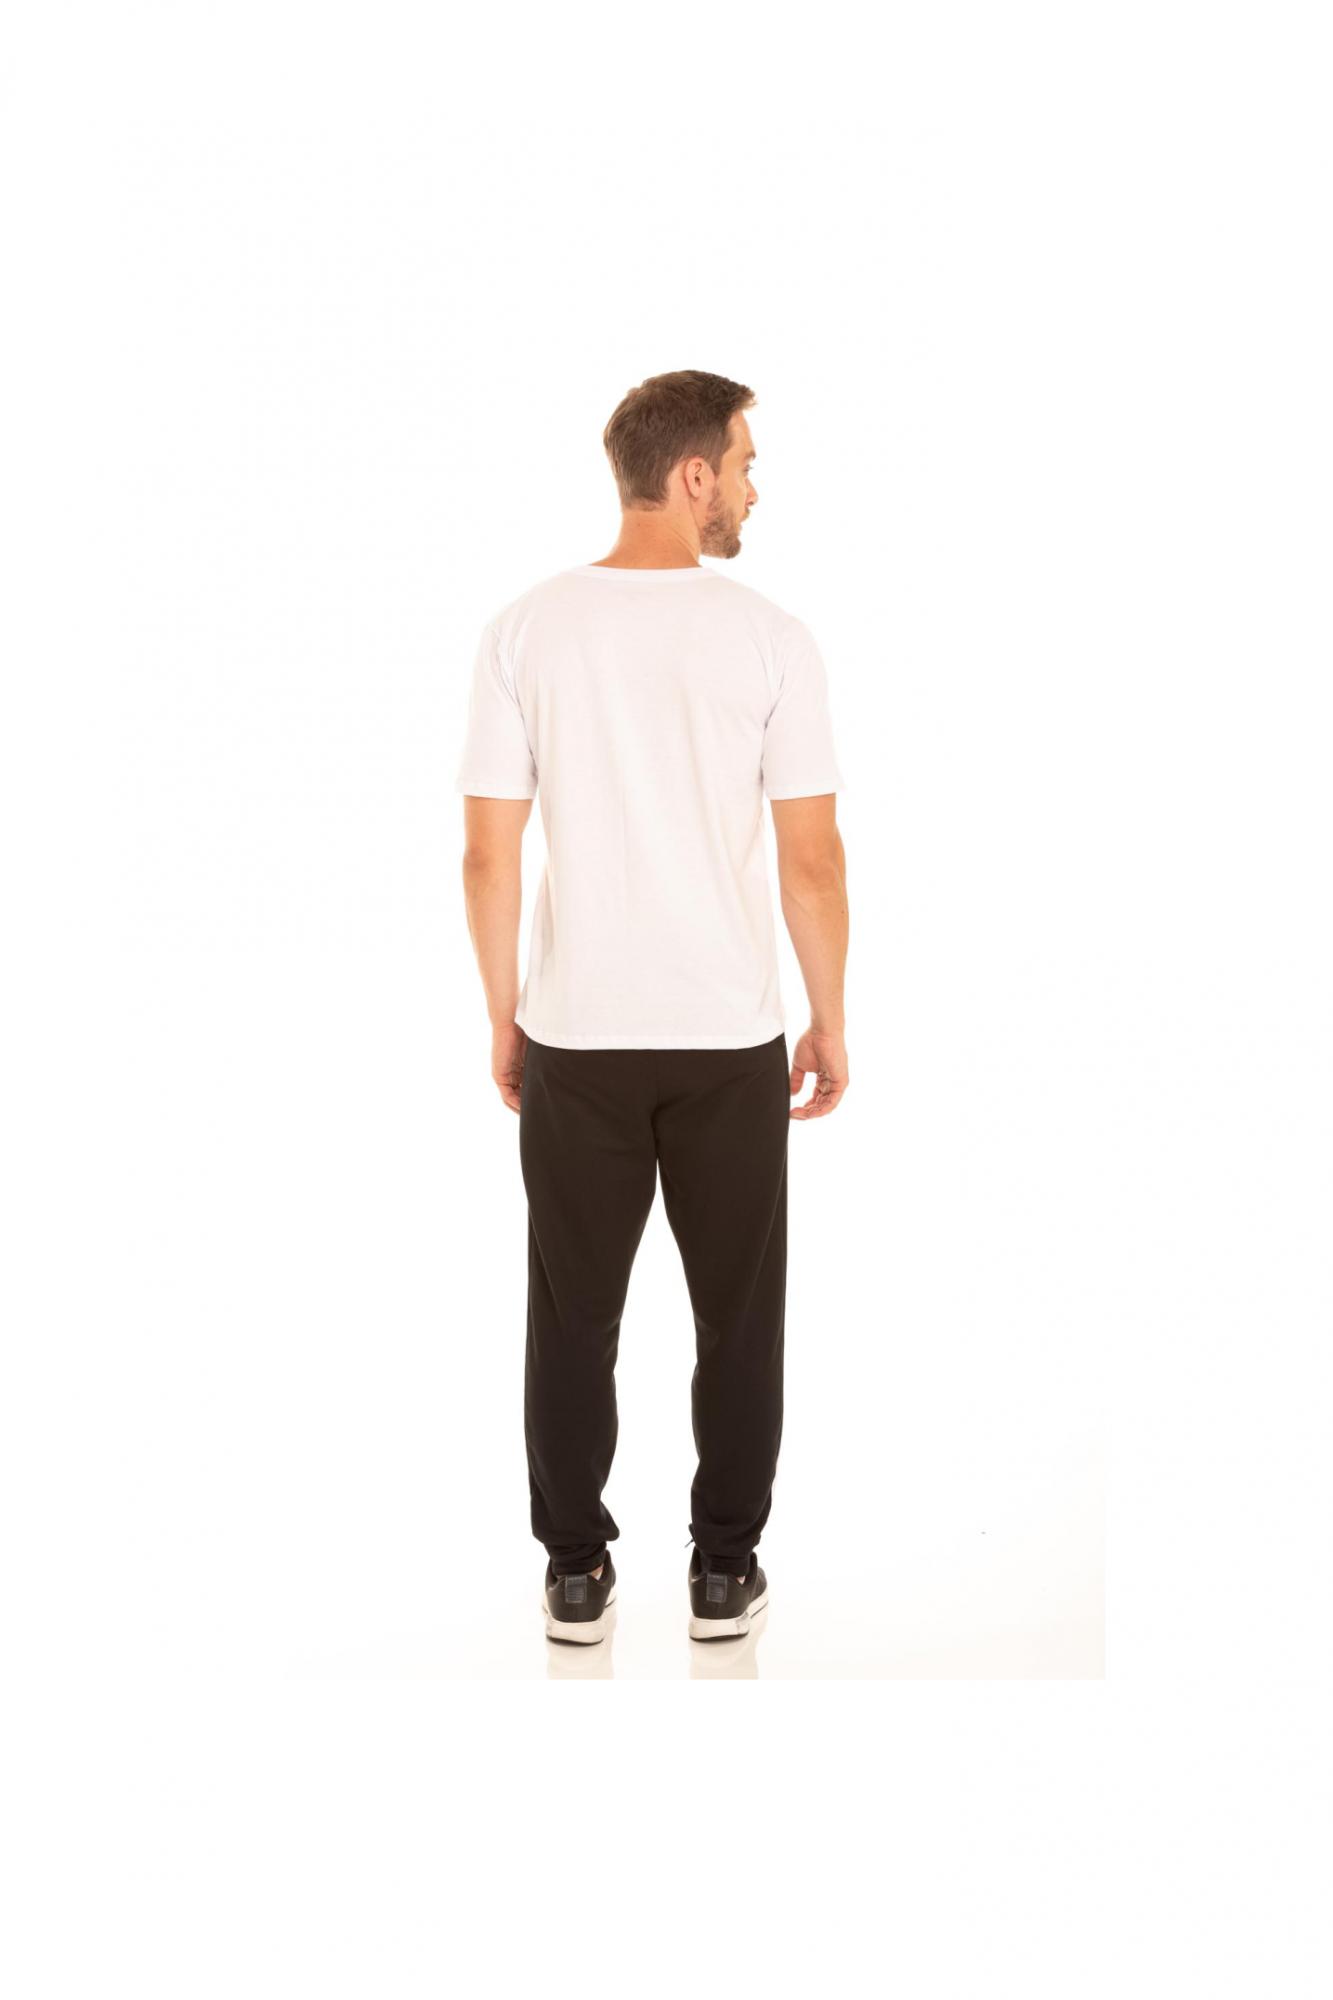 Camisa Adulta Masculina Avulsa